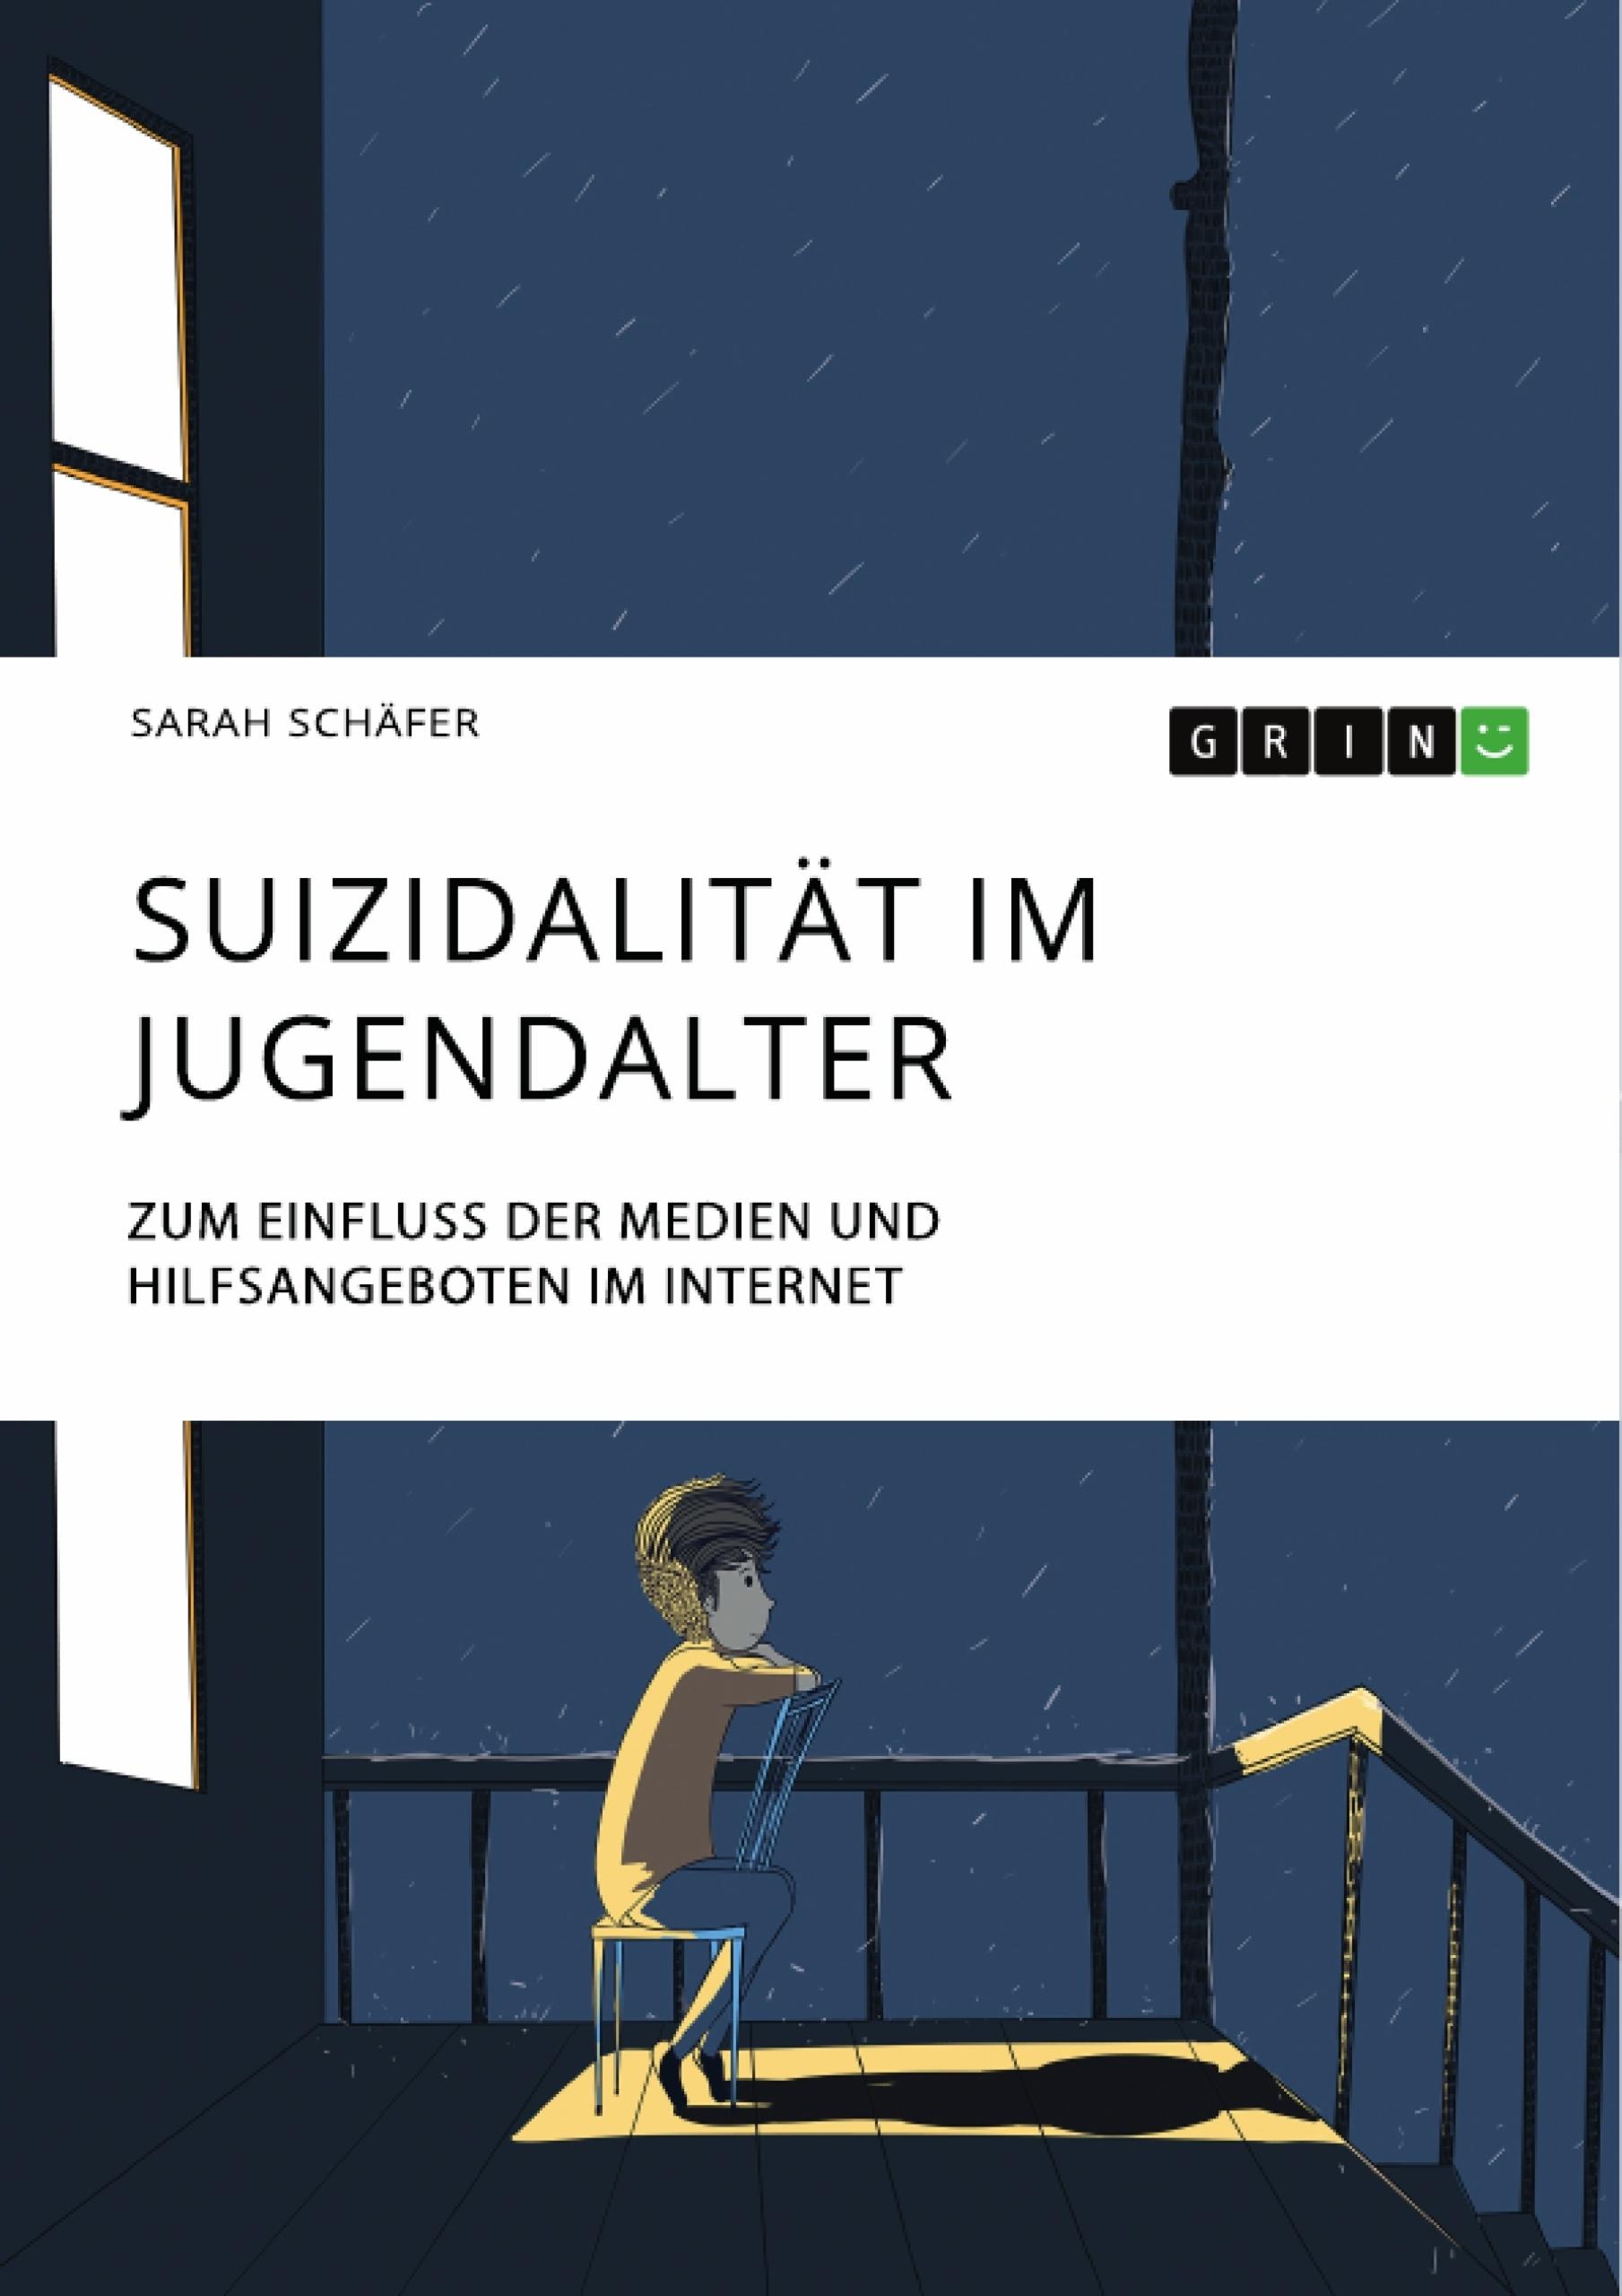 Titel: Suizidalität im Jugendalter